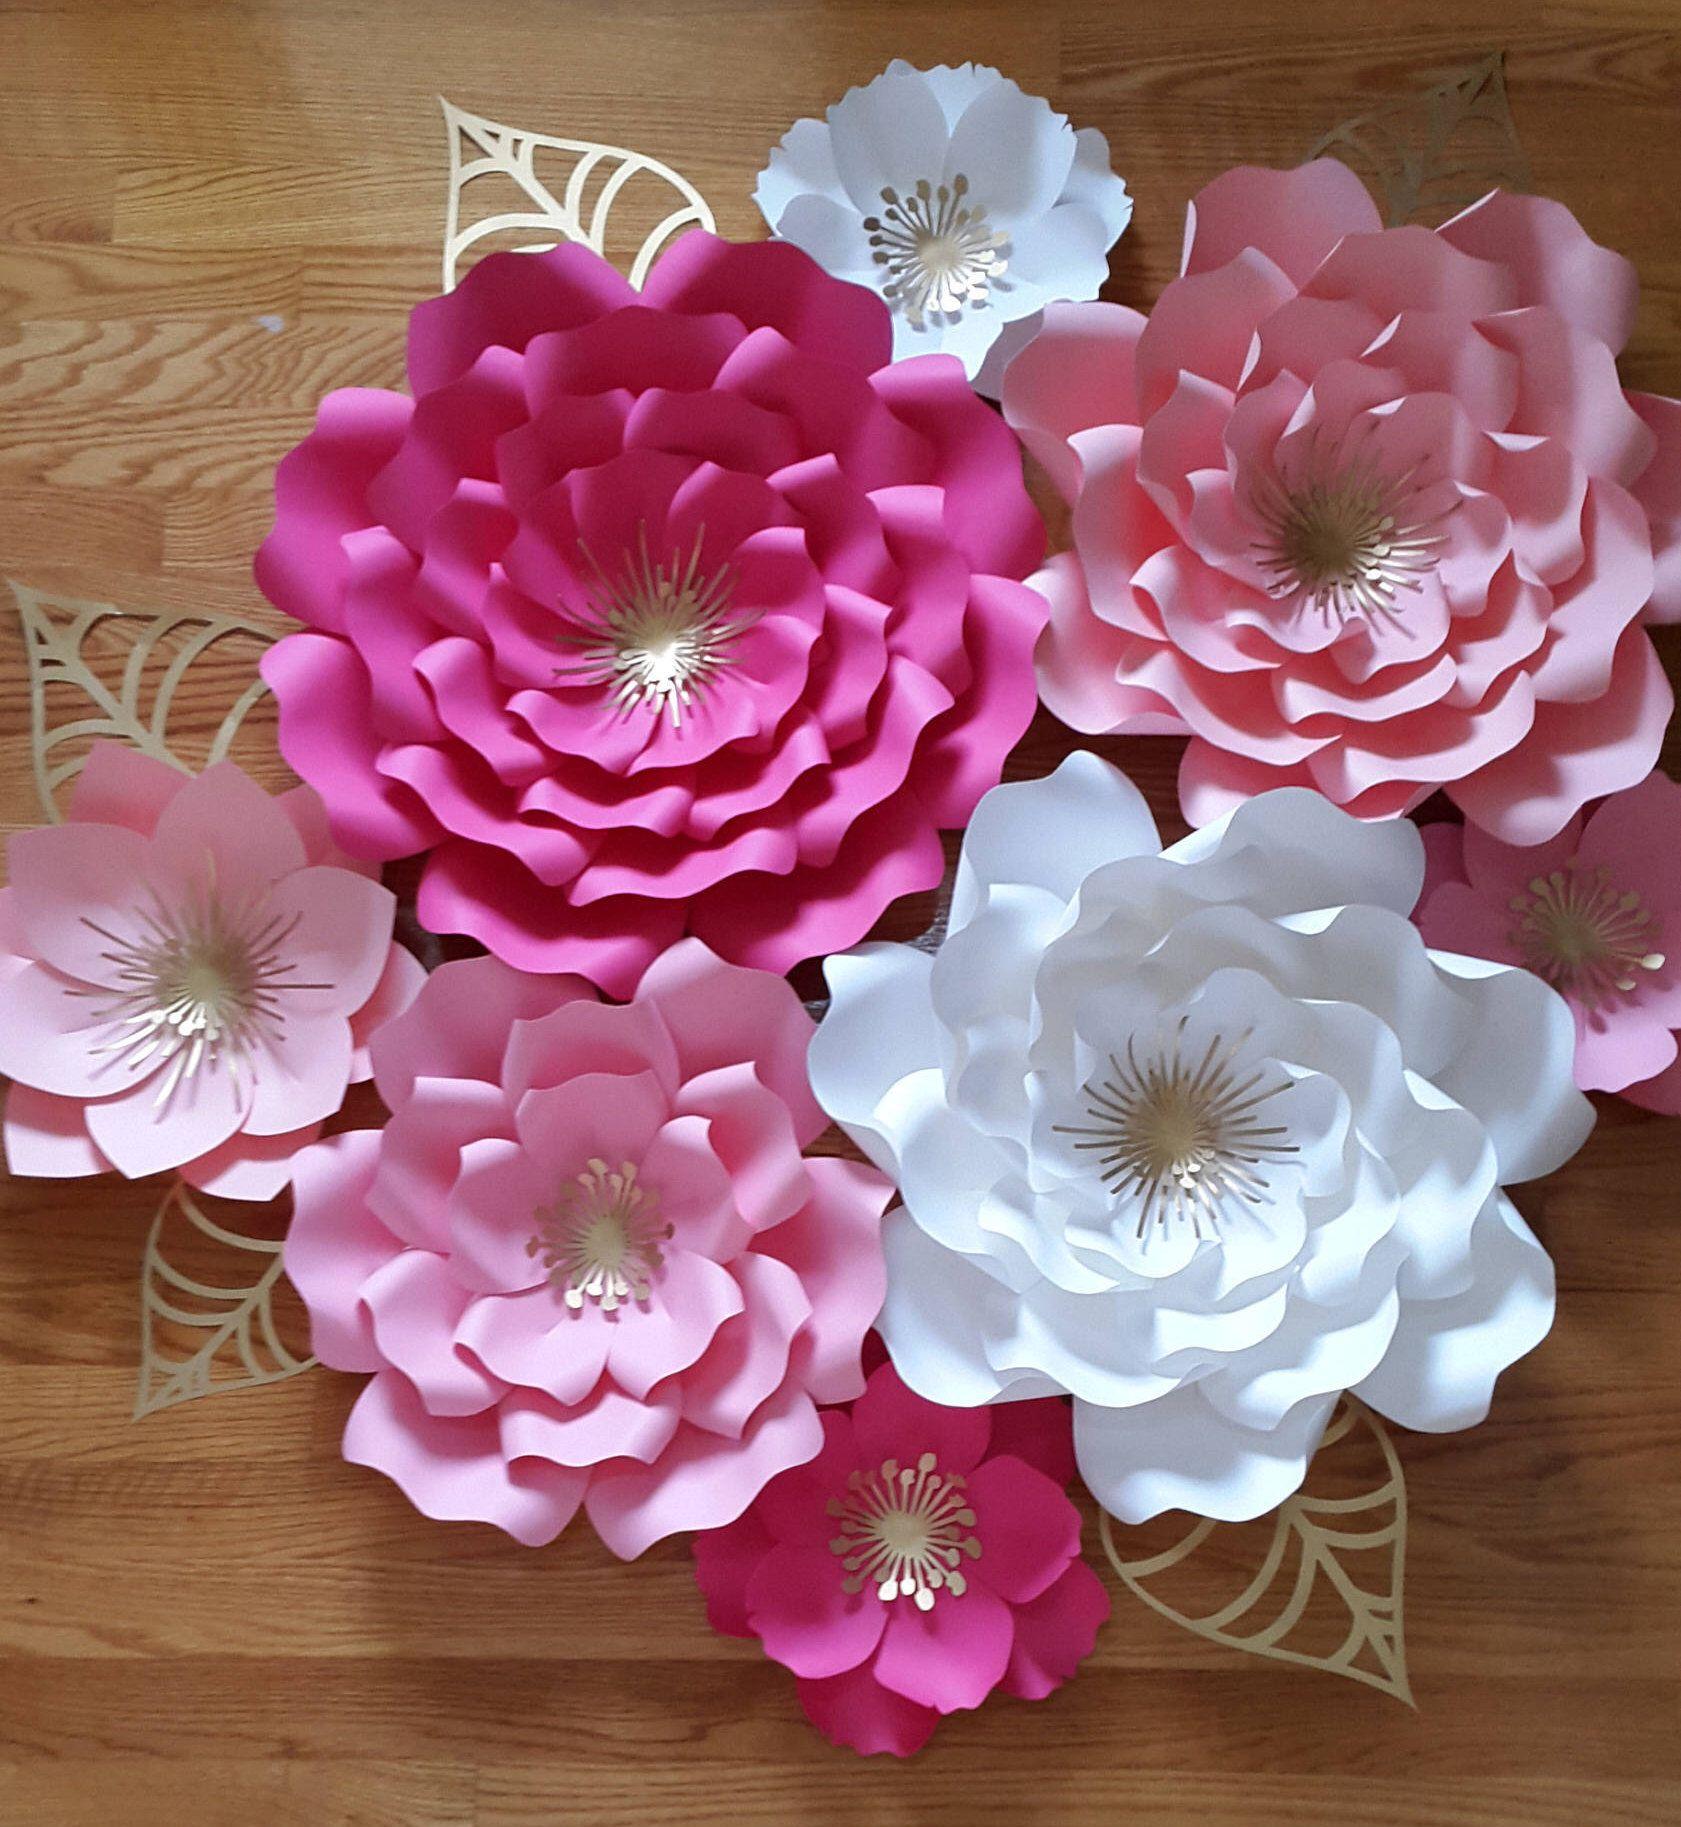 Paper Flower Backdrop, Paper Flower Nursery Decor, Paper Flower For